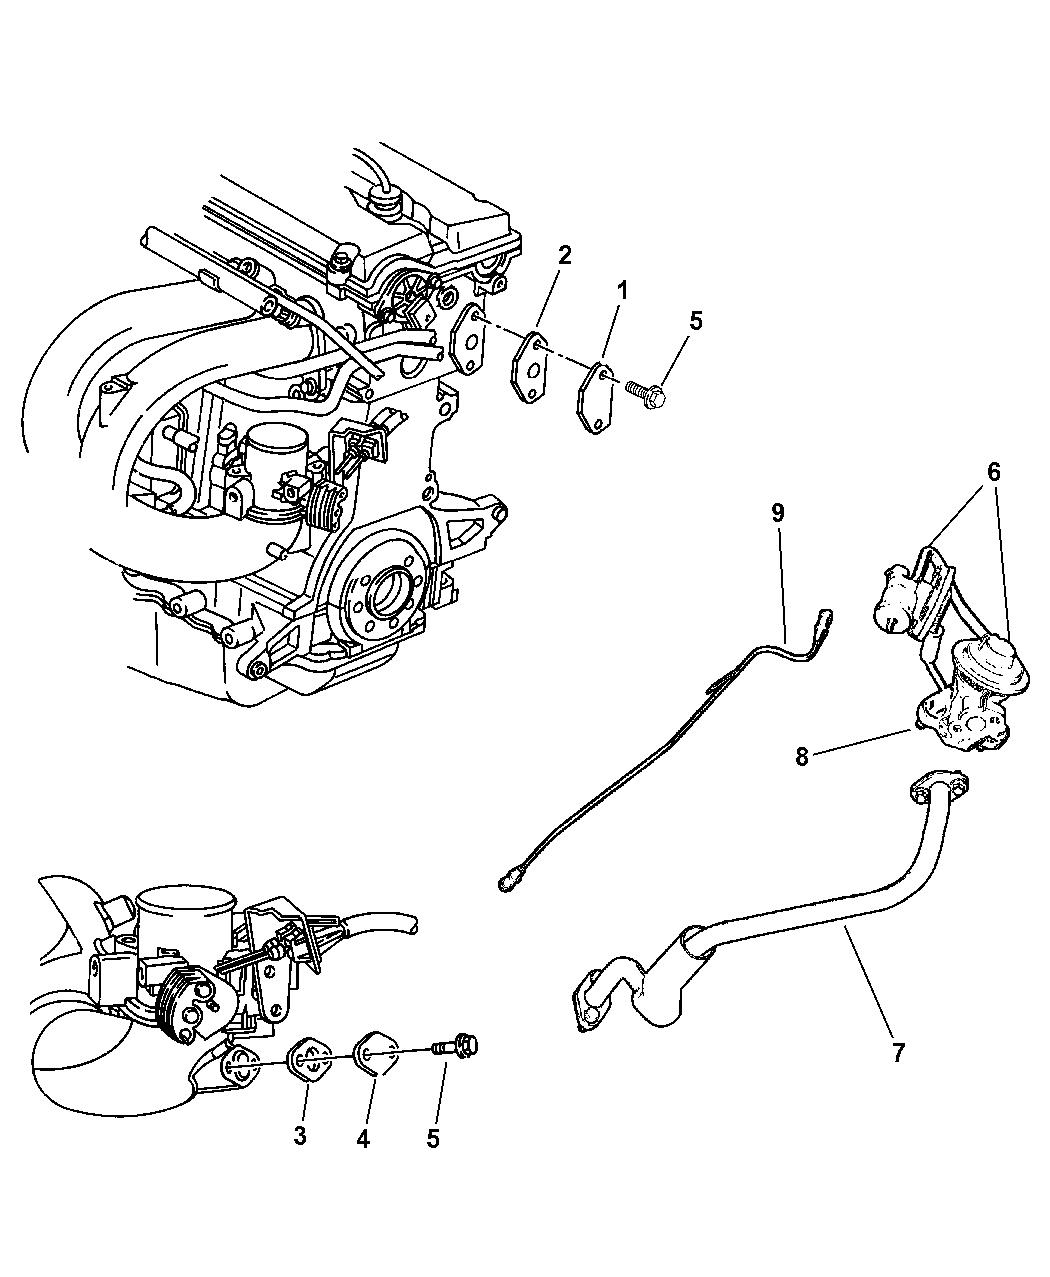 1999 Dodge Durango Blower Motor Wiring Diagram